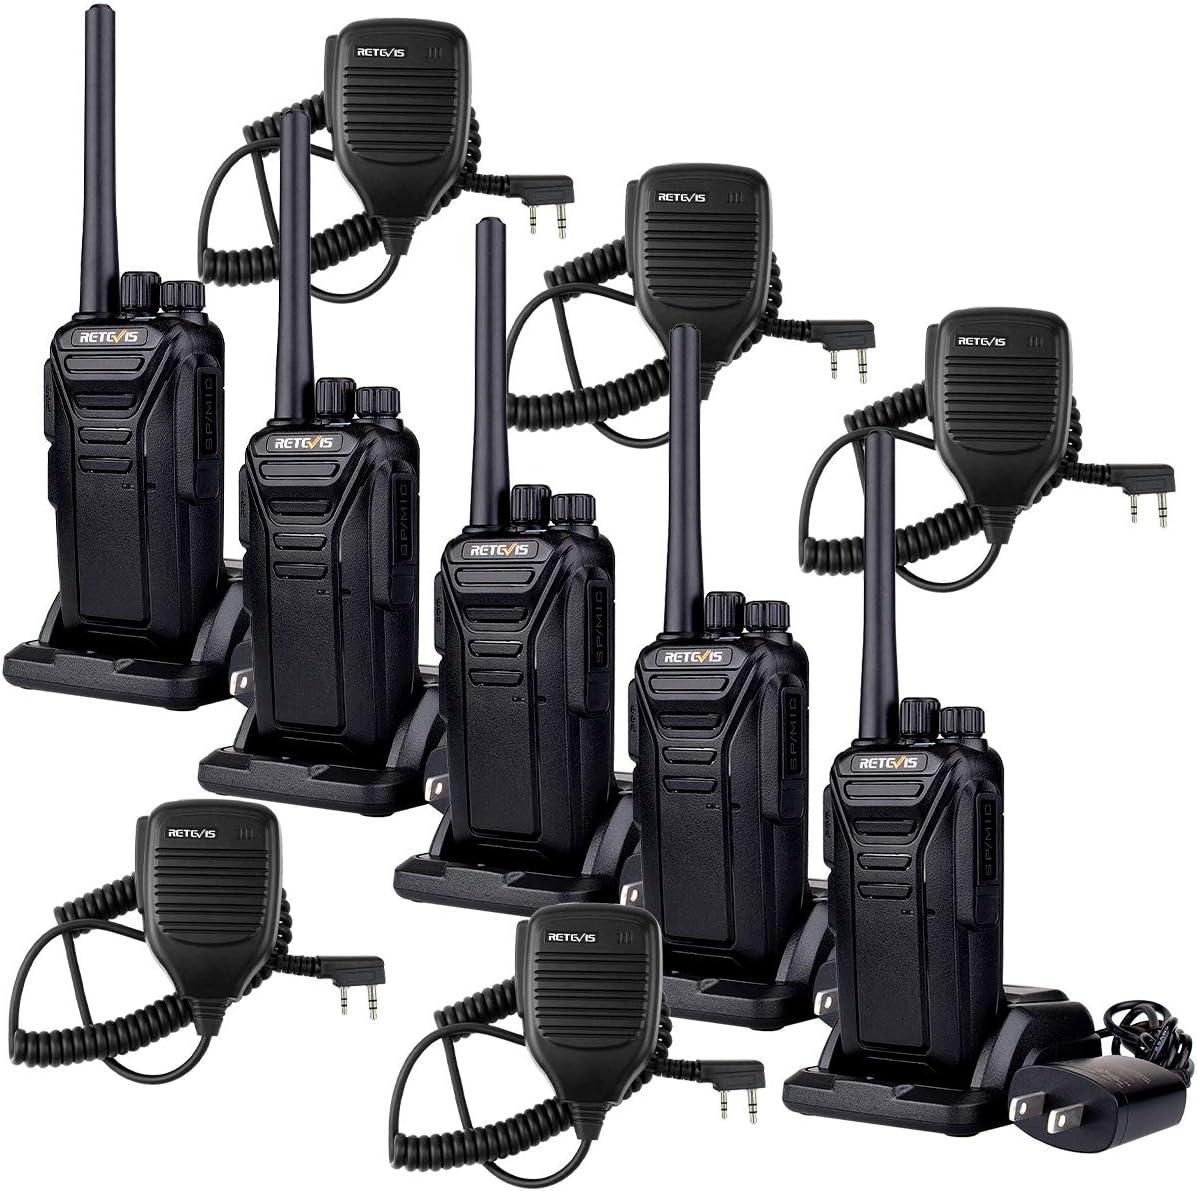 Retevis RT27 Walkie Talkies with Speaker Mic 22 CH Hands Free Well Built Long Range Rechargeable 2 Way Radios 5 Pack